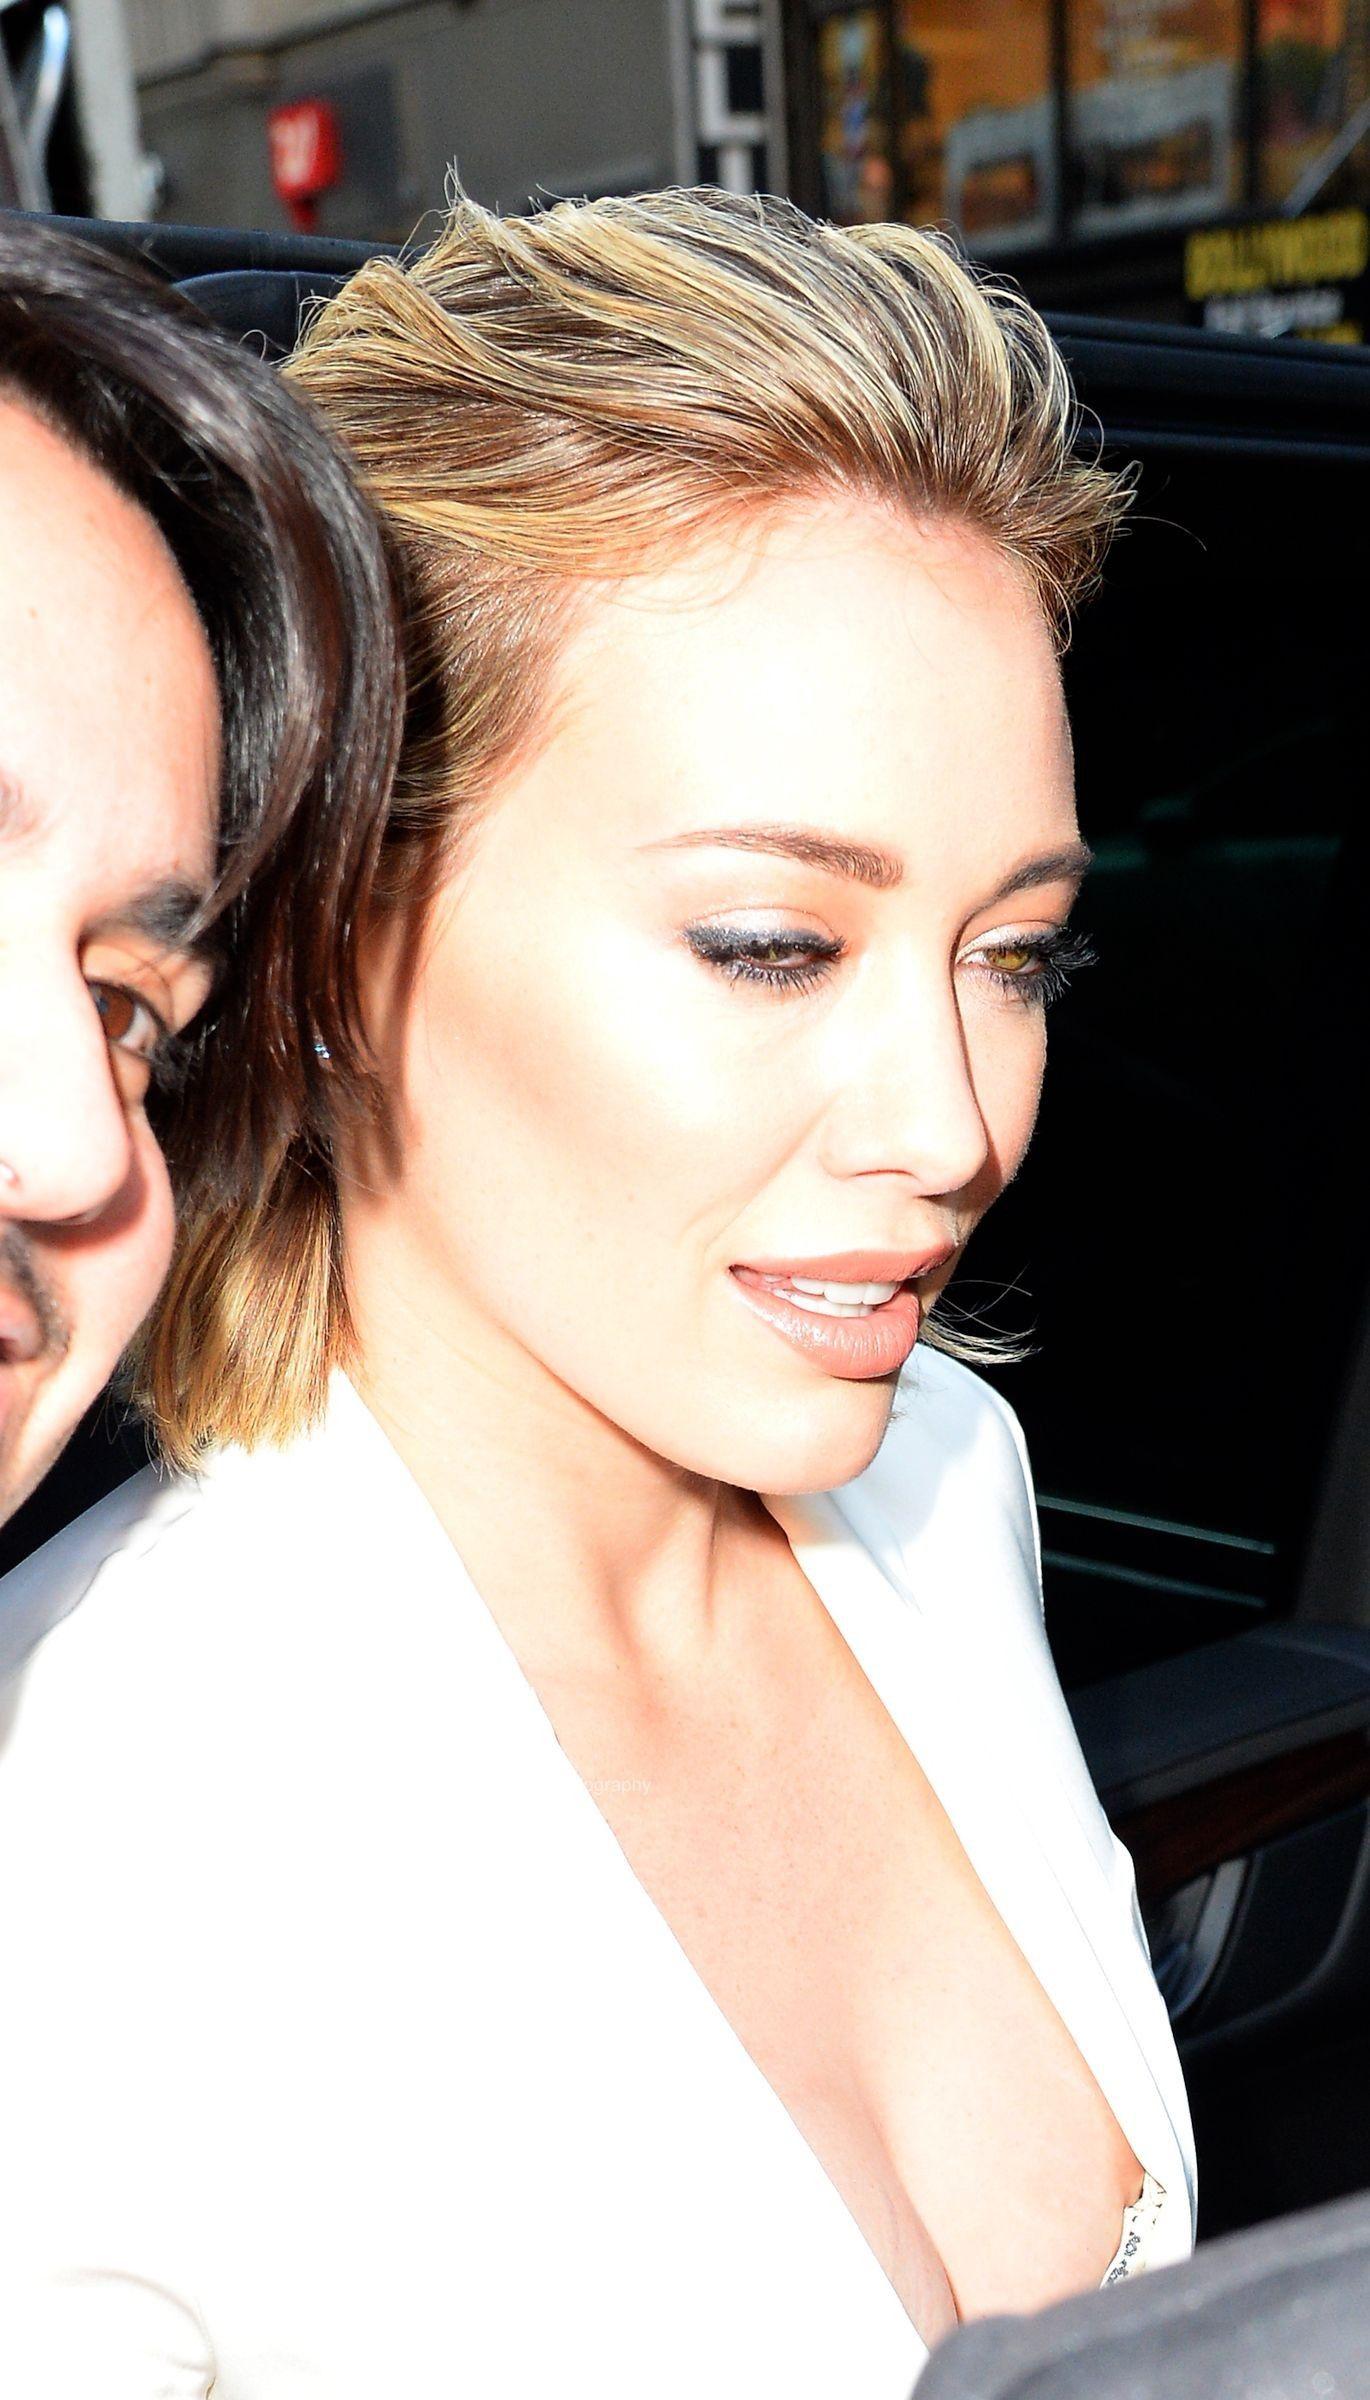 Hilary-Duff-Nipple-Slip-2